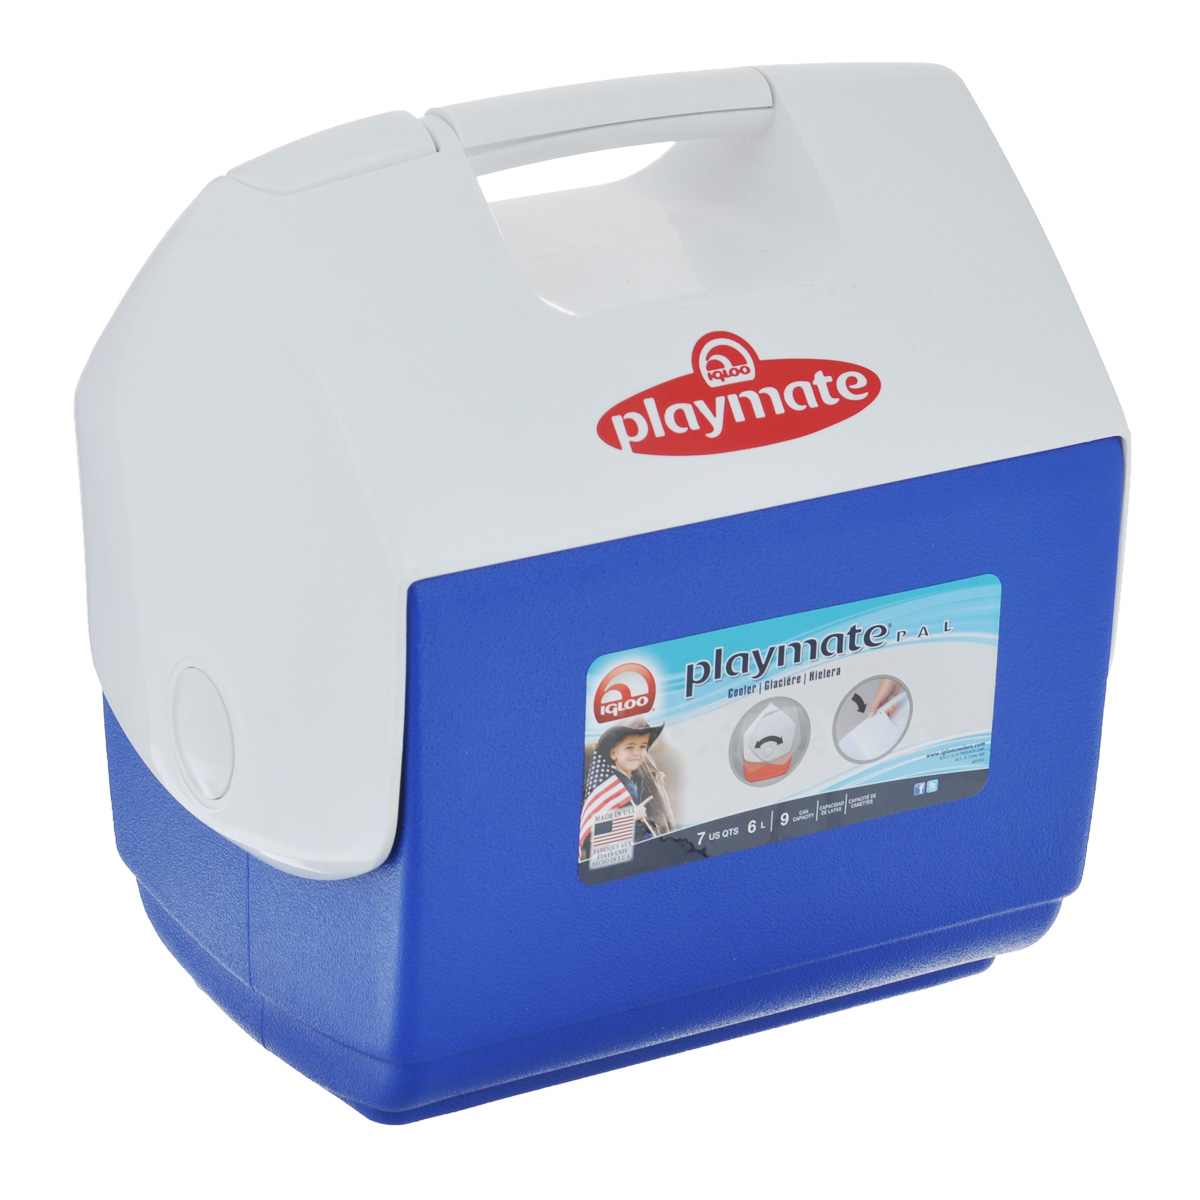 Изотермический контейнер Igloo Playmate Pal, цвет: синий, 6 л сумка изотермический контейнер igloo playmate gripper 22 00157767